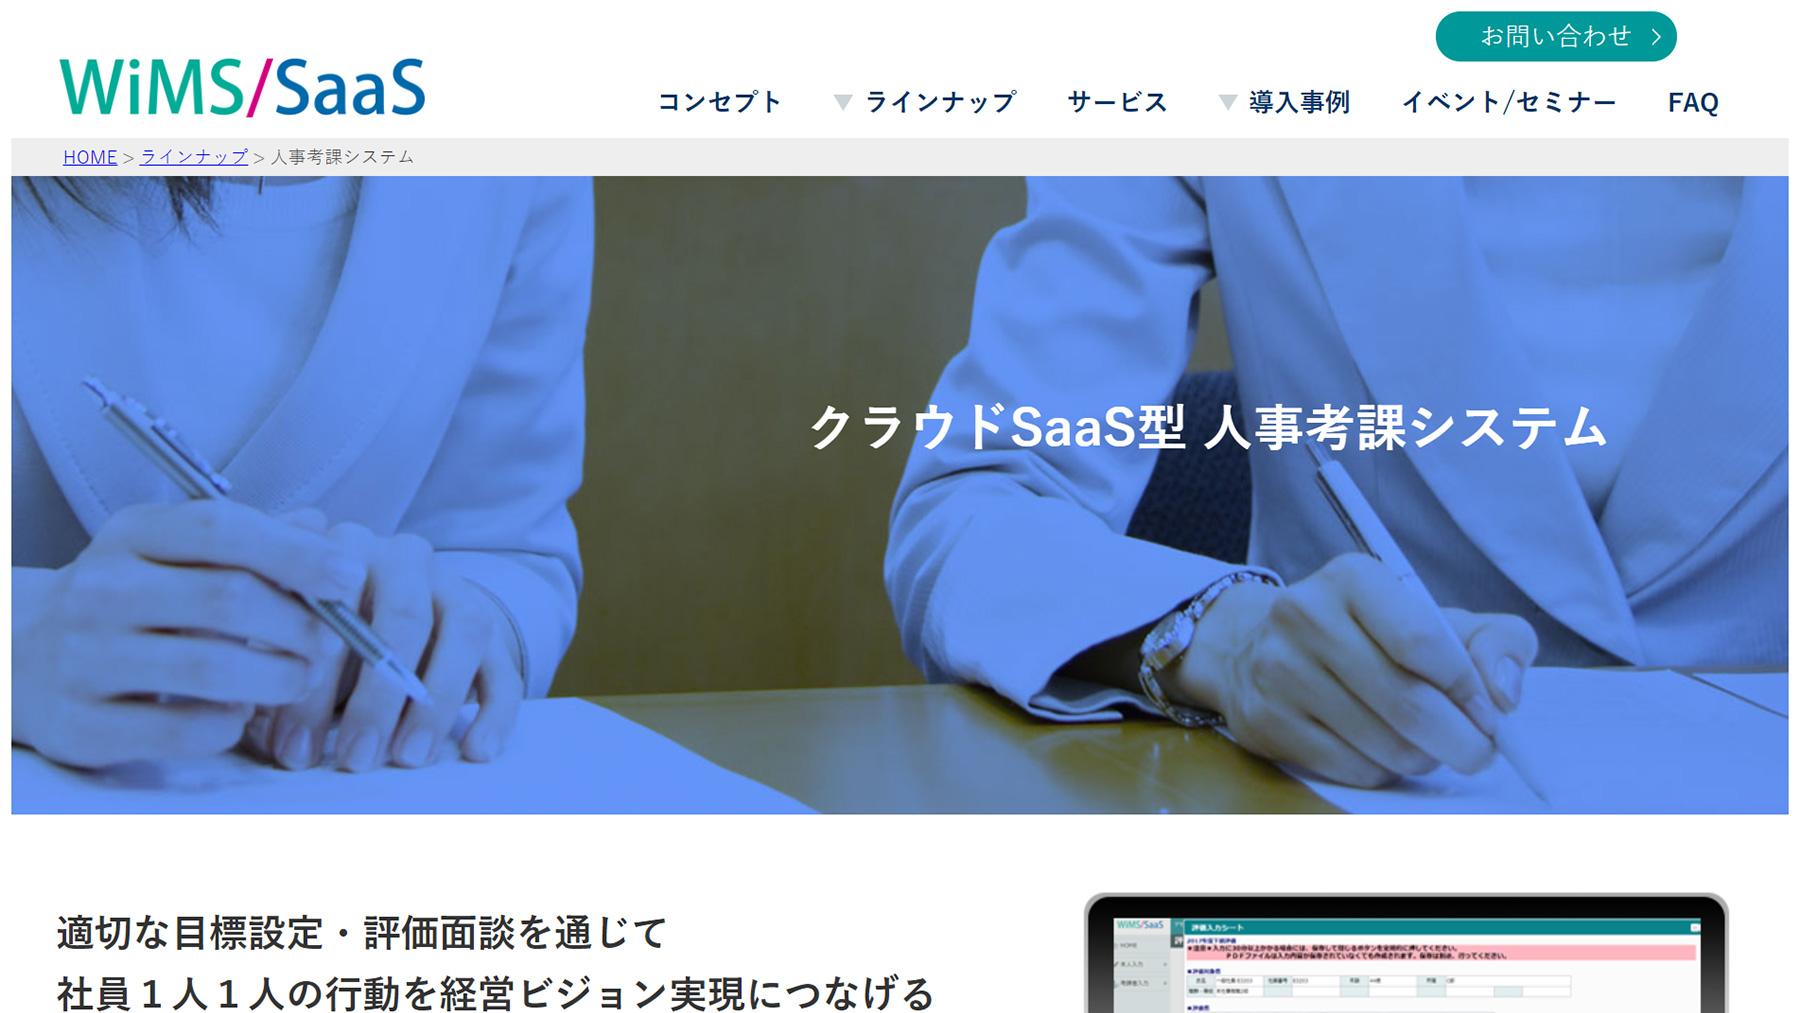 WiMS/SaaS人事考課システム公式Webサイト